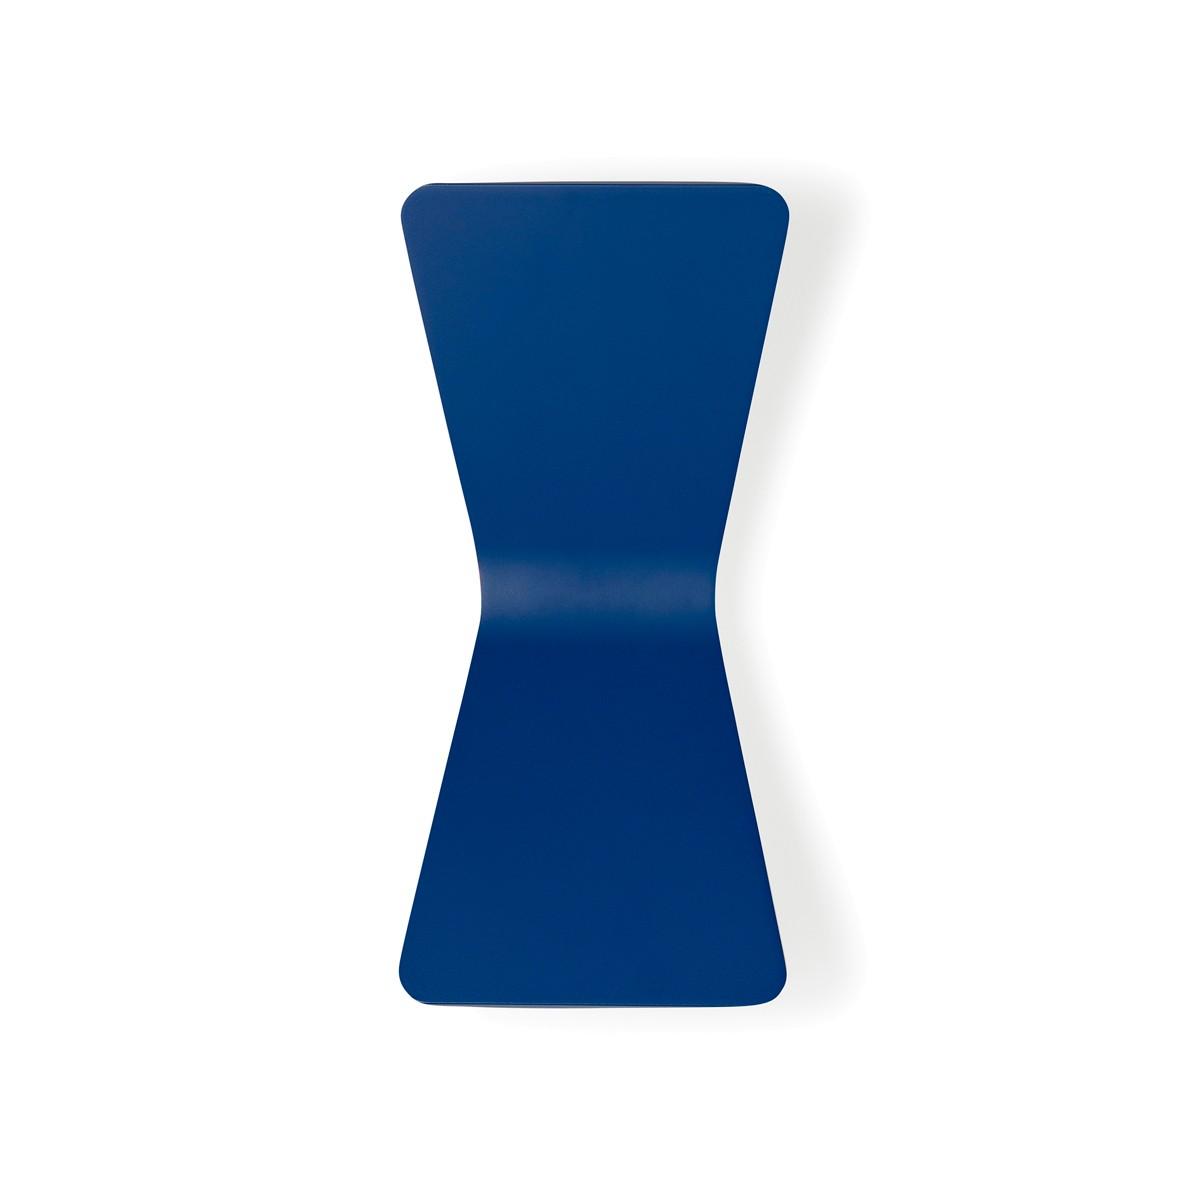 Fontana Arte Flex Wandleuchte, blau